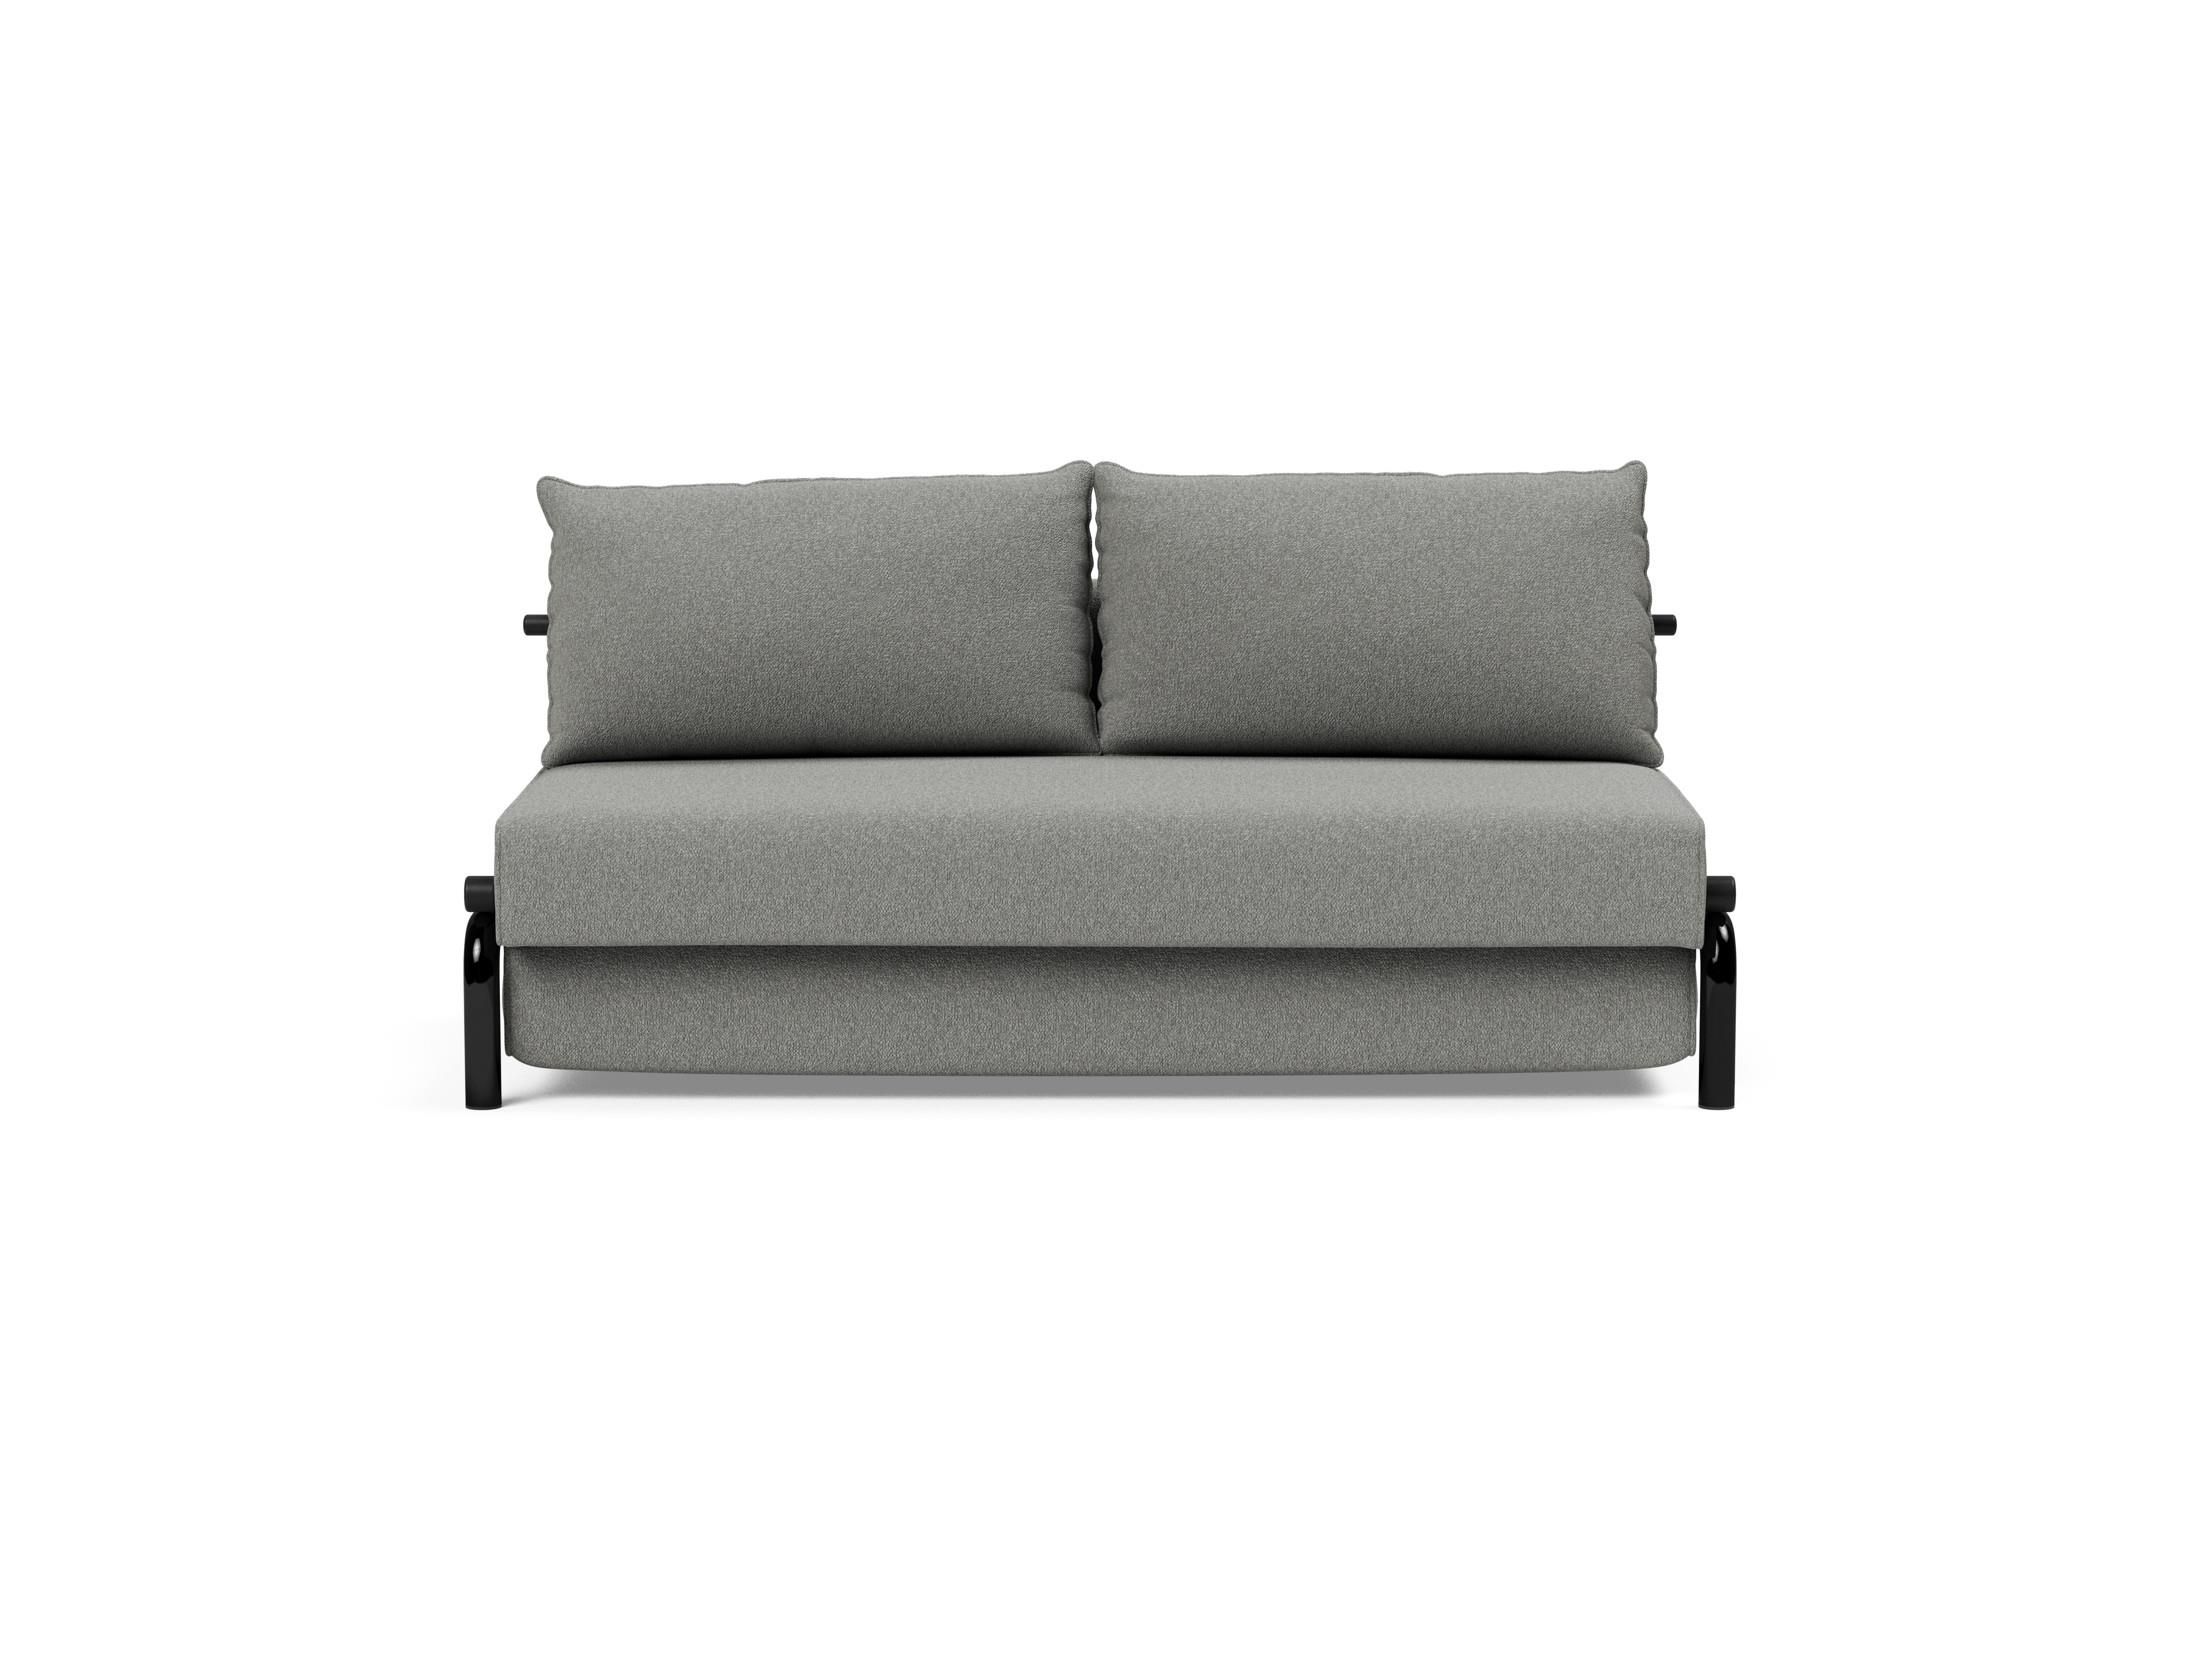 media/image/Ramone-160-Tubi-Sofa-Bed-533-p1-webXM1MhTQHZL7AE.jpg